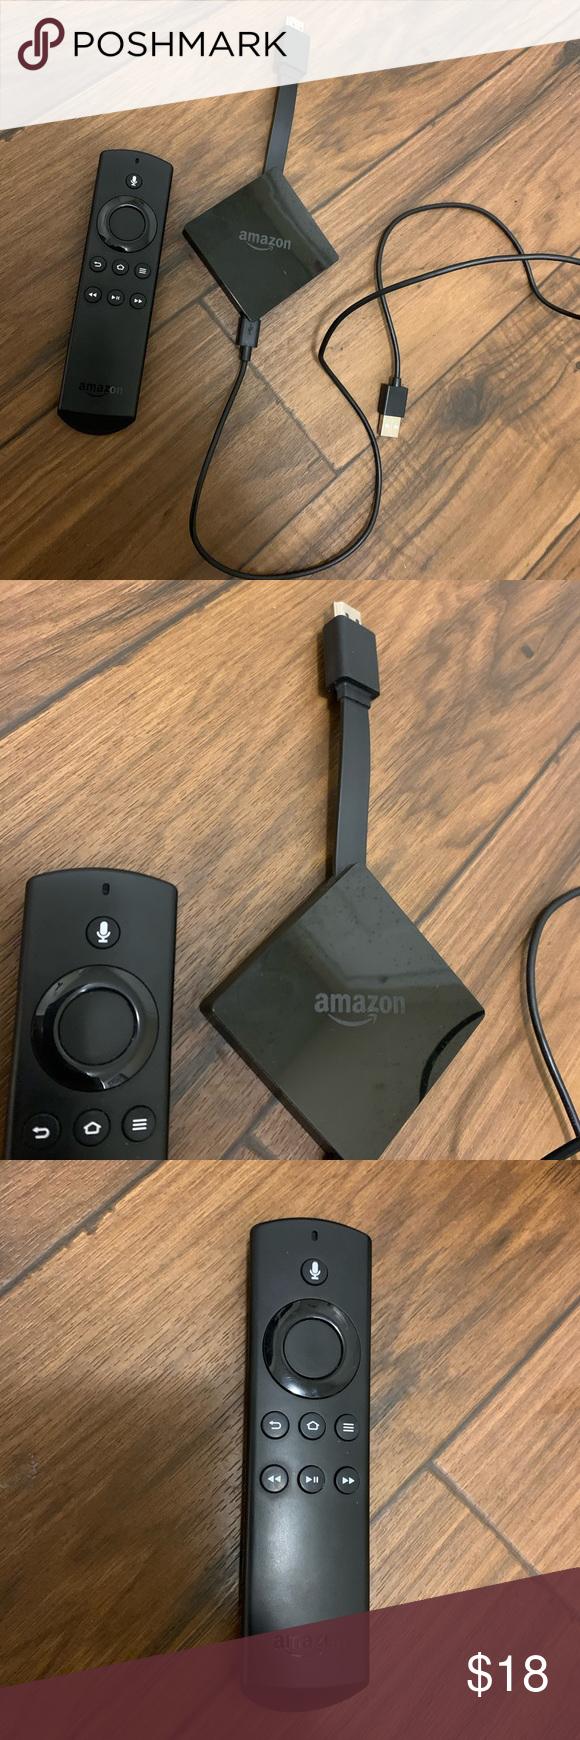 Amazon Fire TV w/remote 4K Alexa Fire tv, Amazon